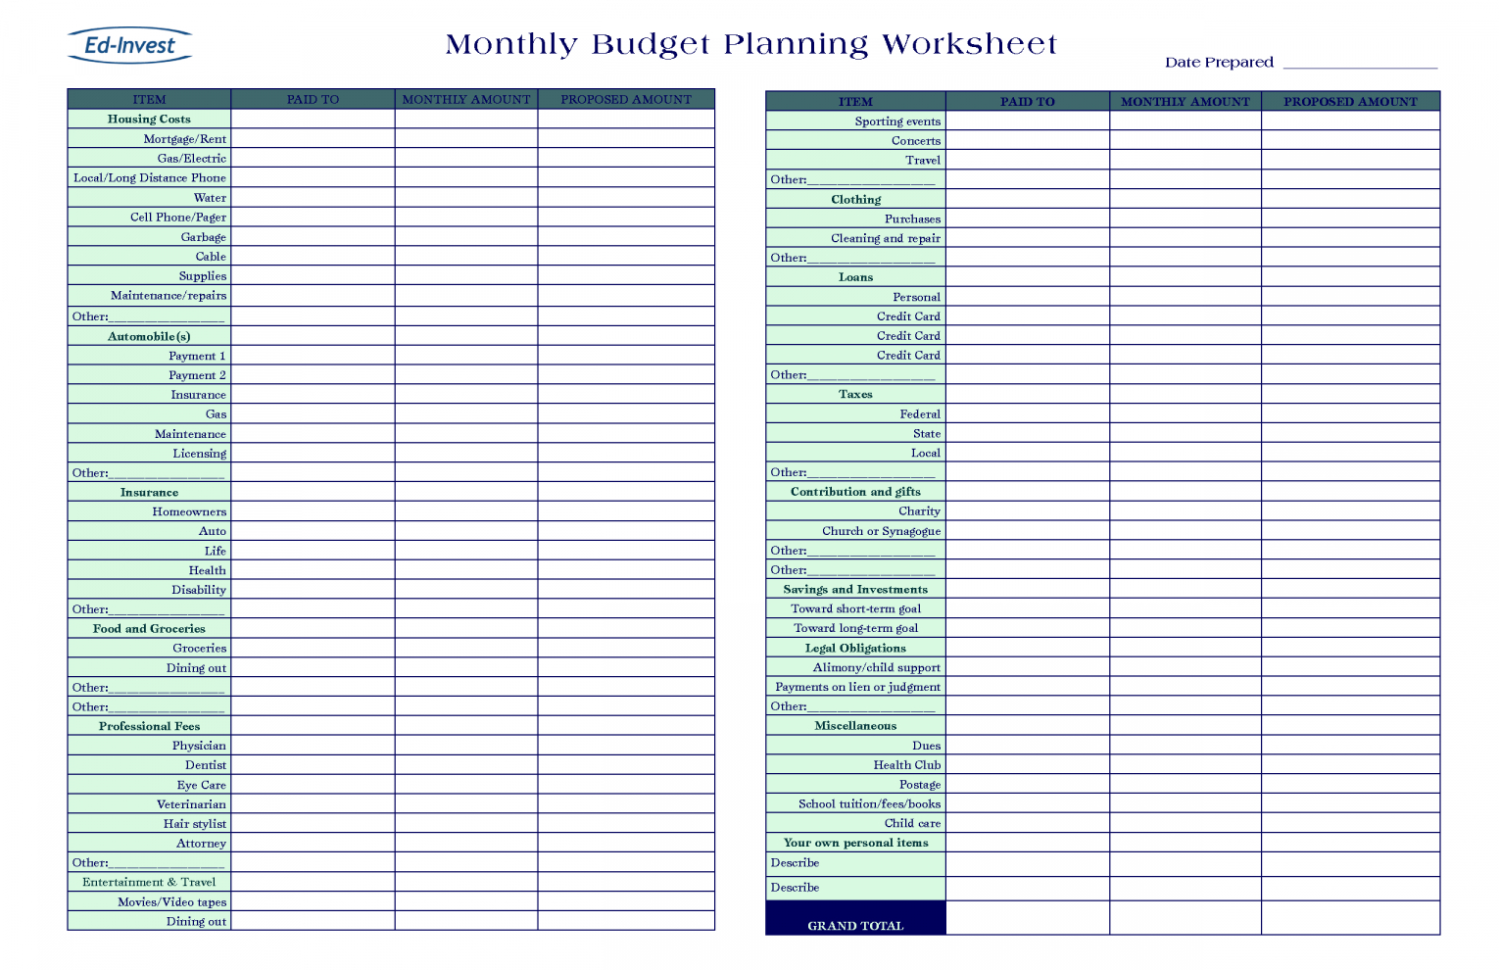 Fresh Budget Calculator Free Spreadsheet   Lancerules Worksheet Inside Budget Calculator Free Spreadsheet